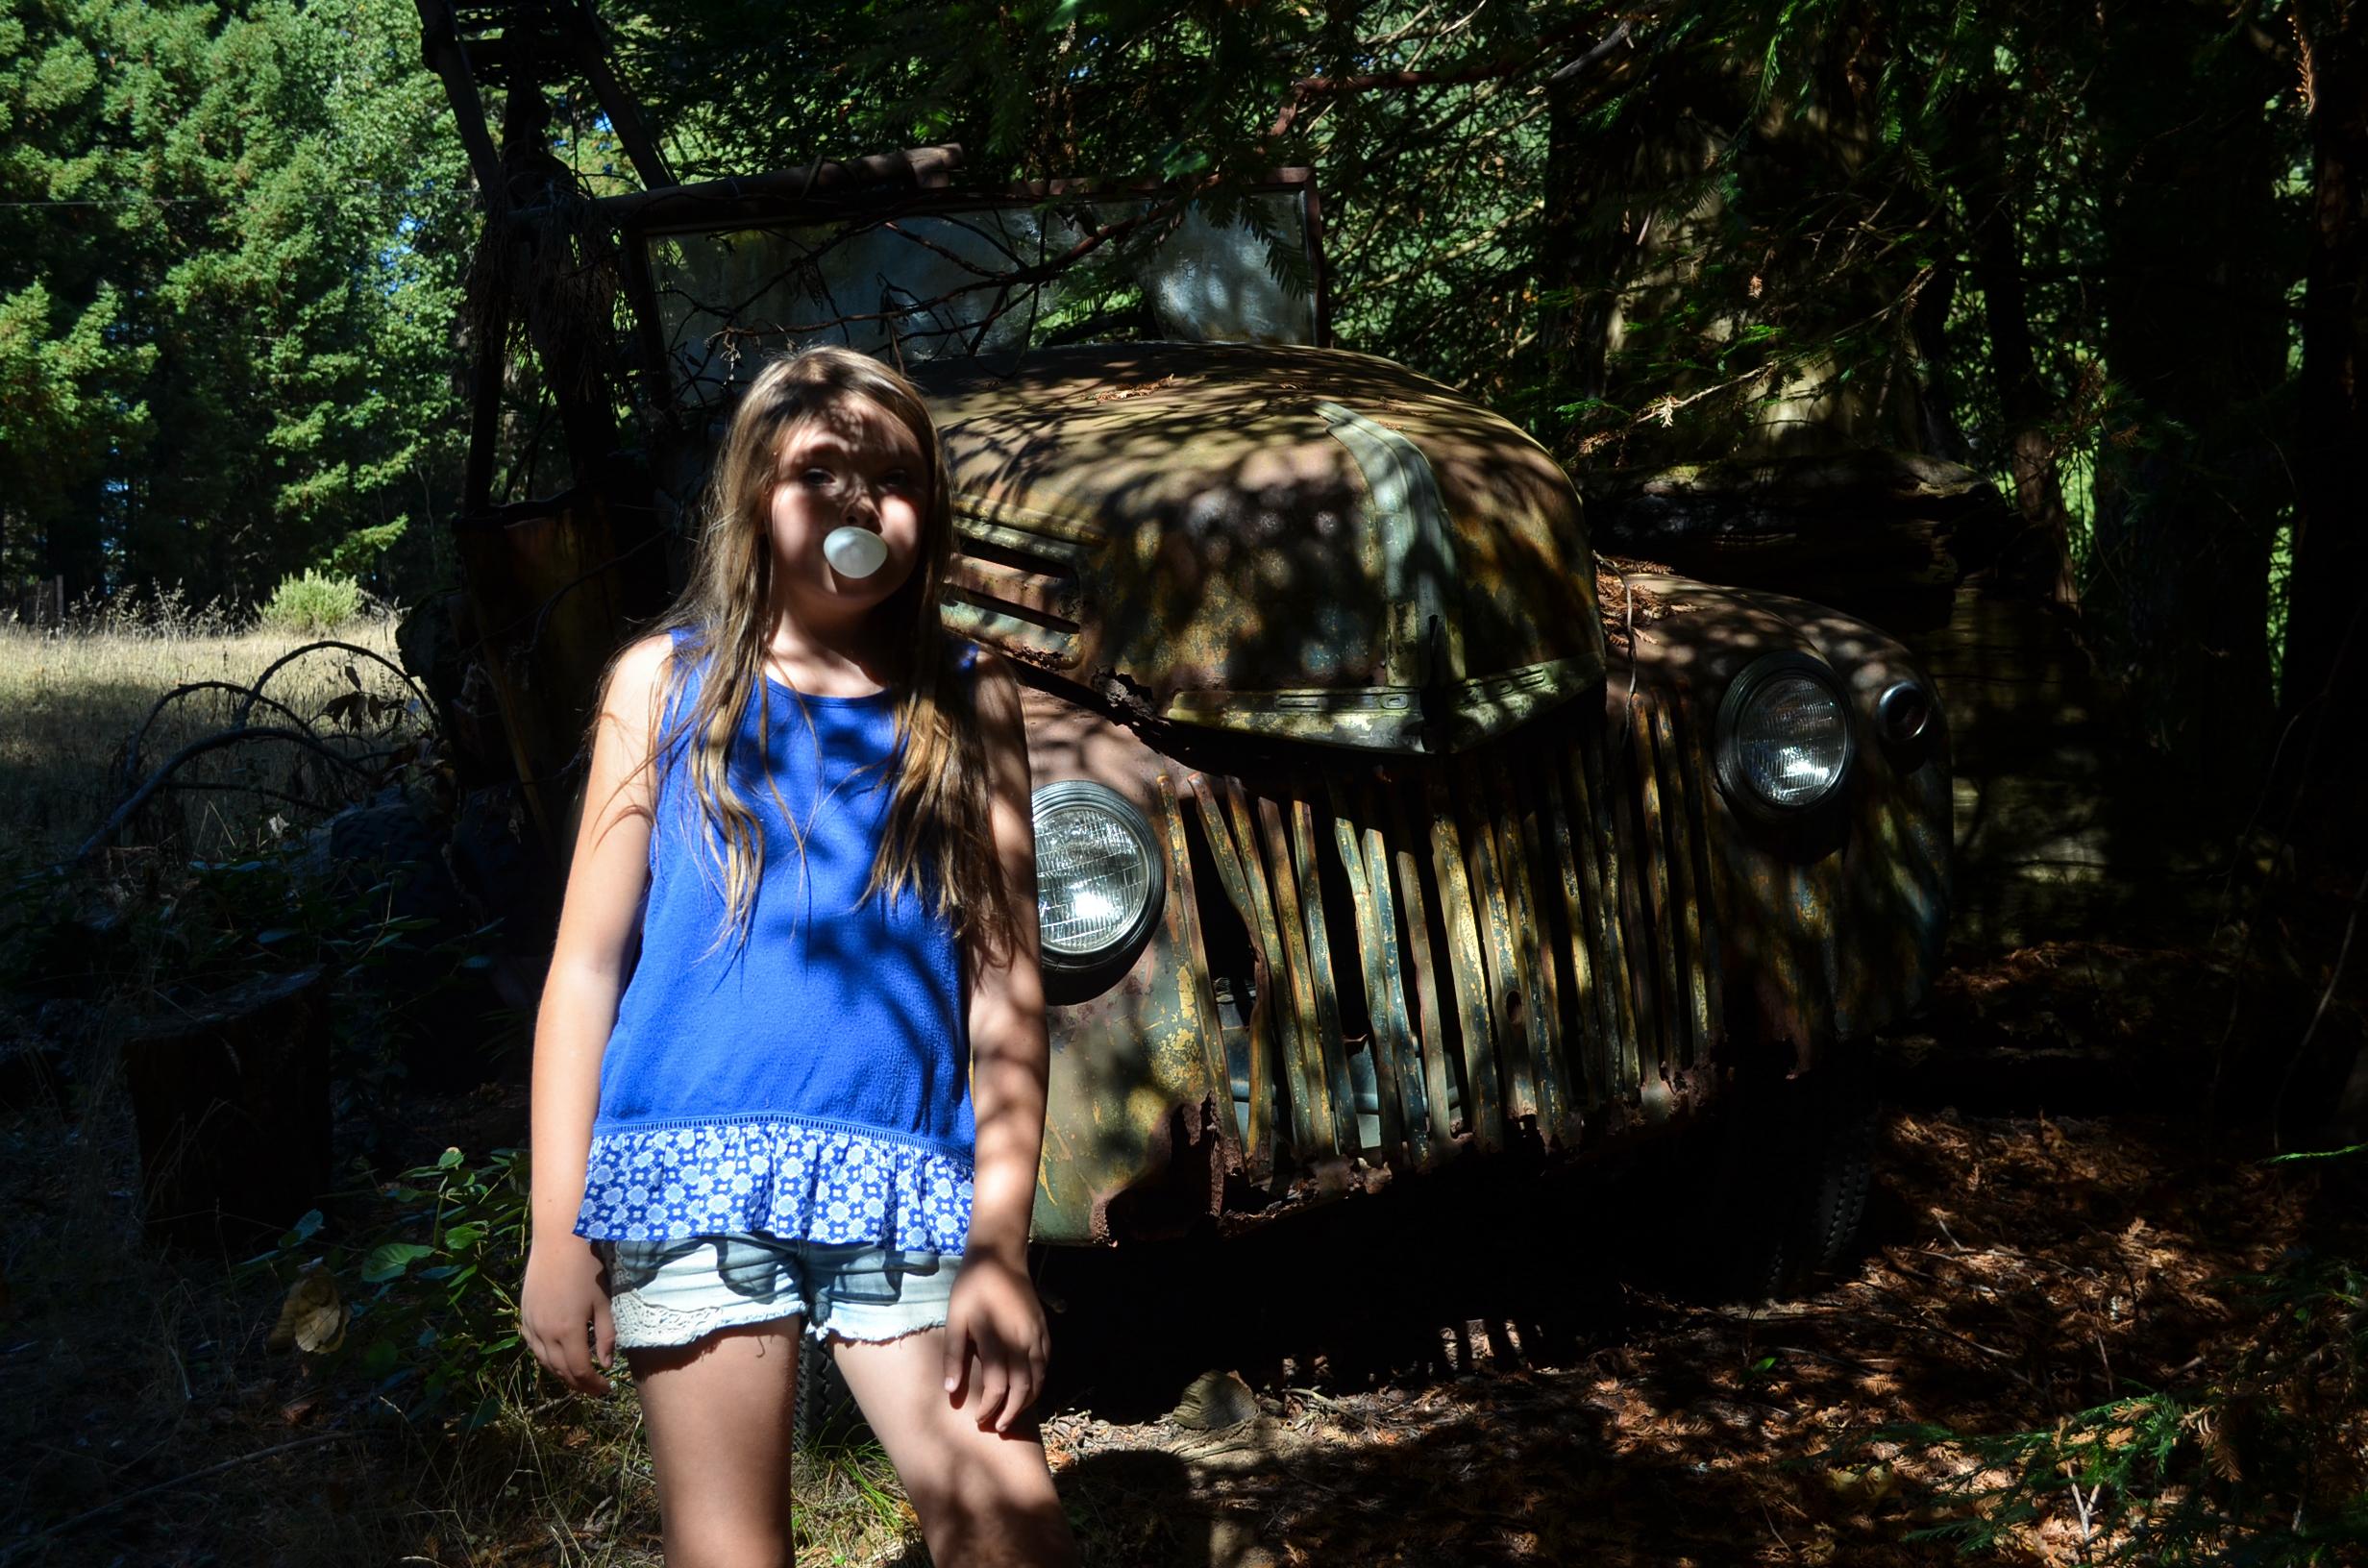 23-Polly-bubble-gum-car-3-7723.jpg